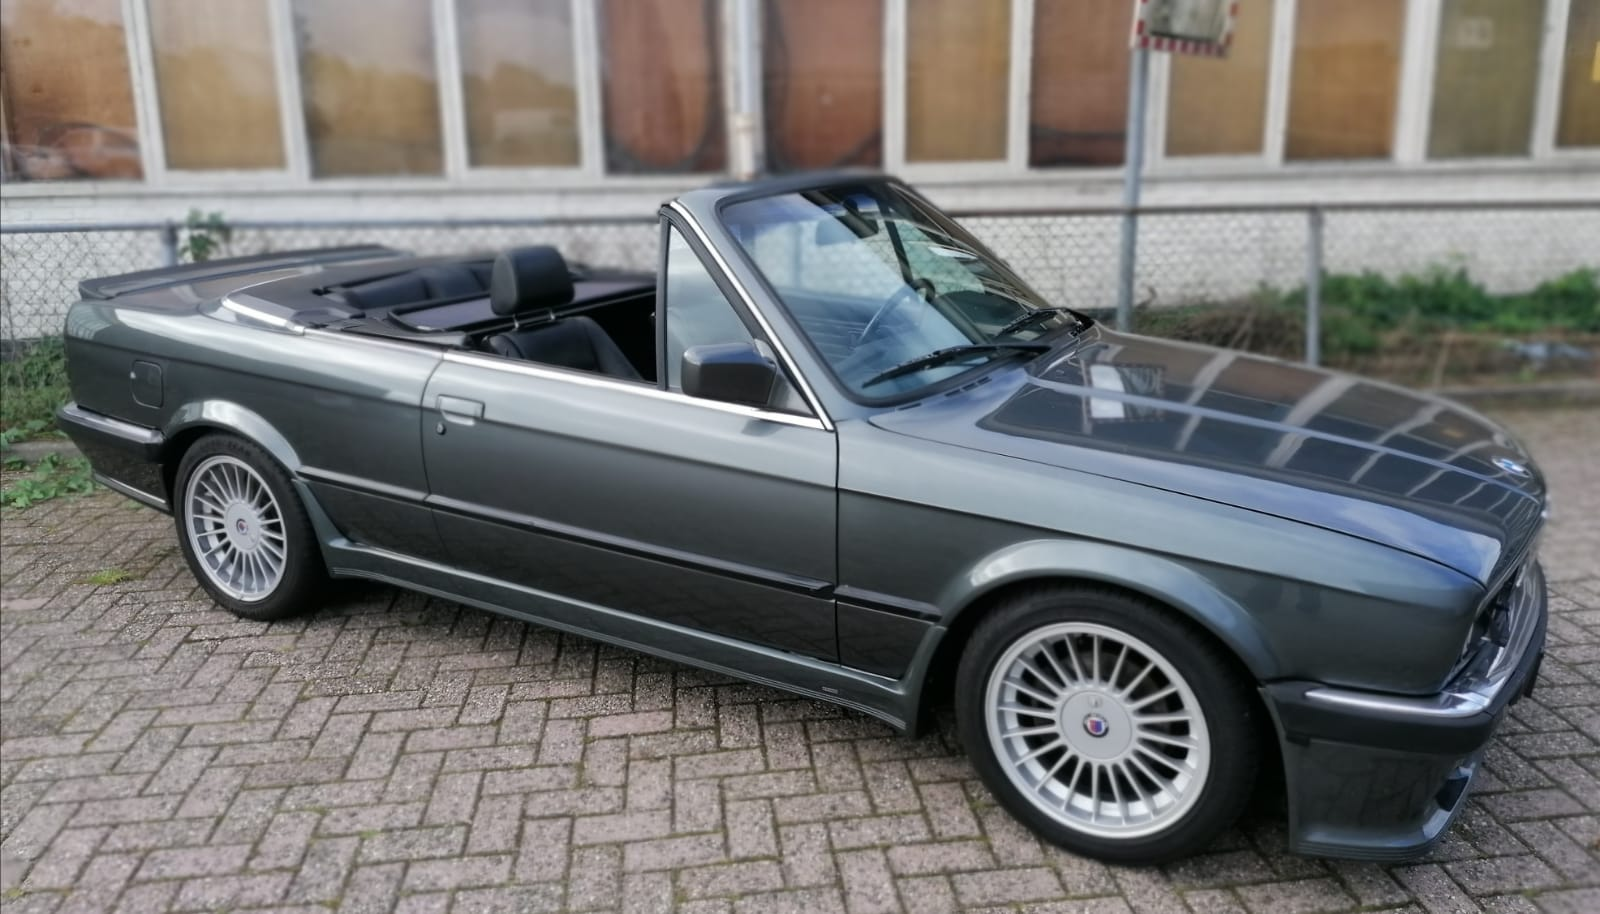 BMW 3 serie 325i cabrio Mtech1 bouwjaar 1987